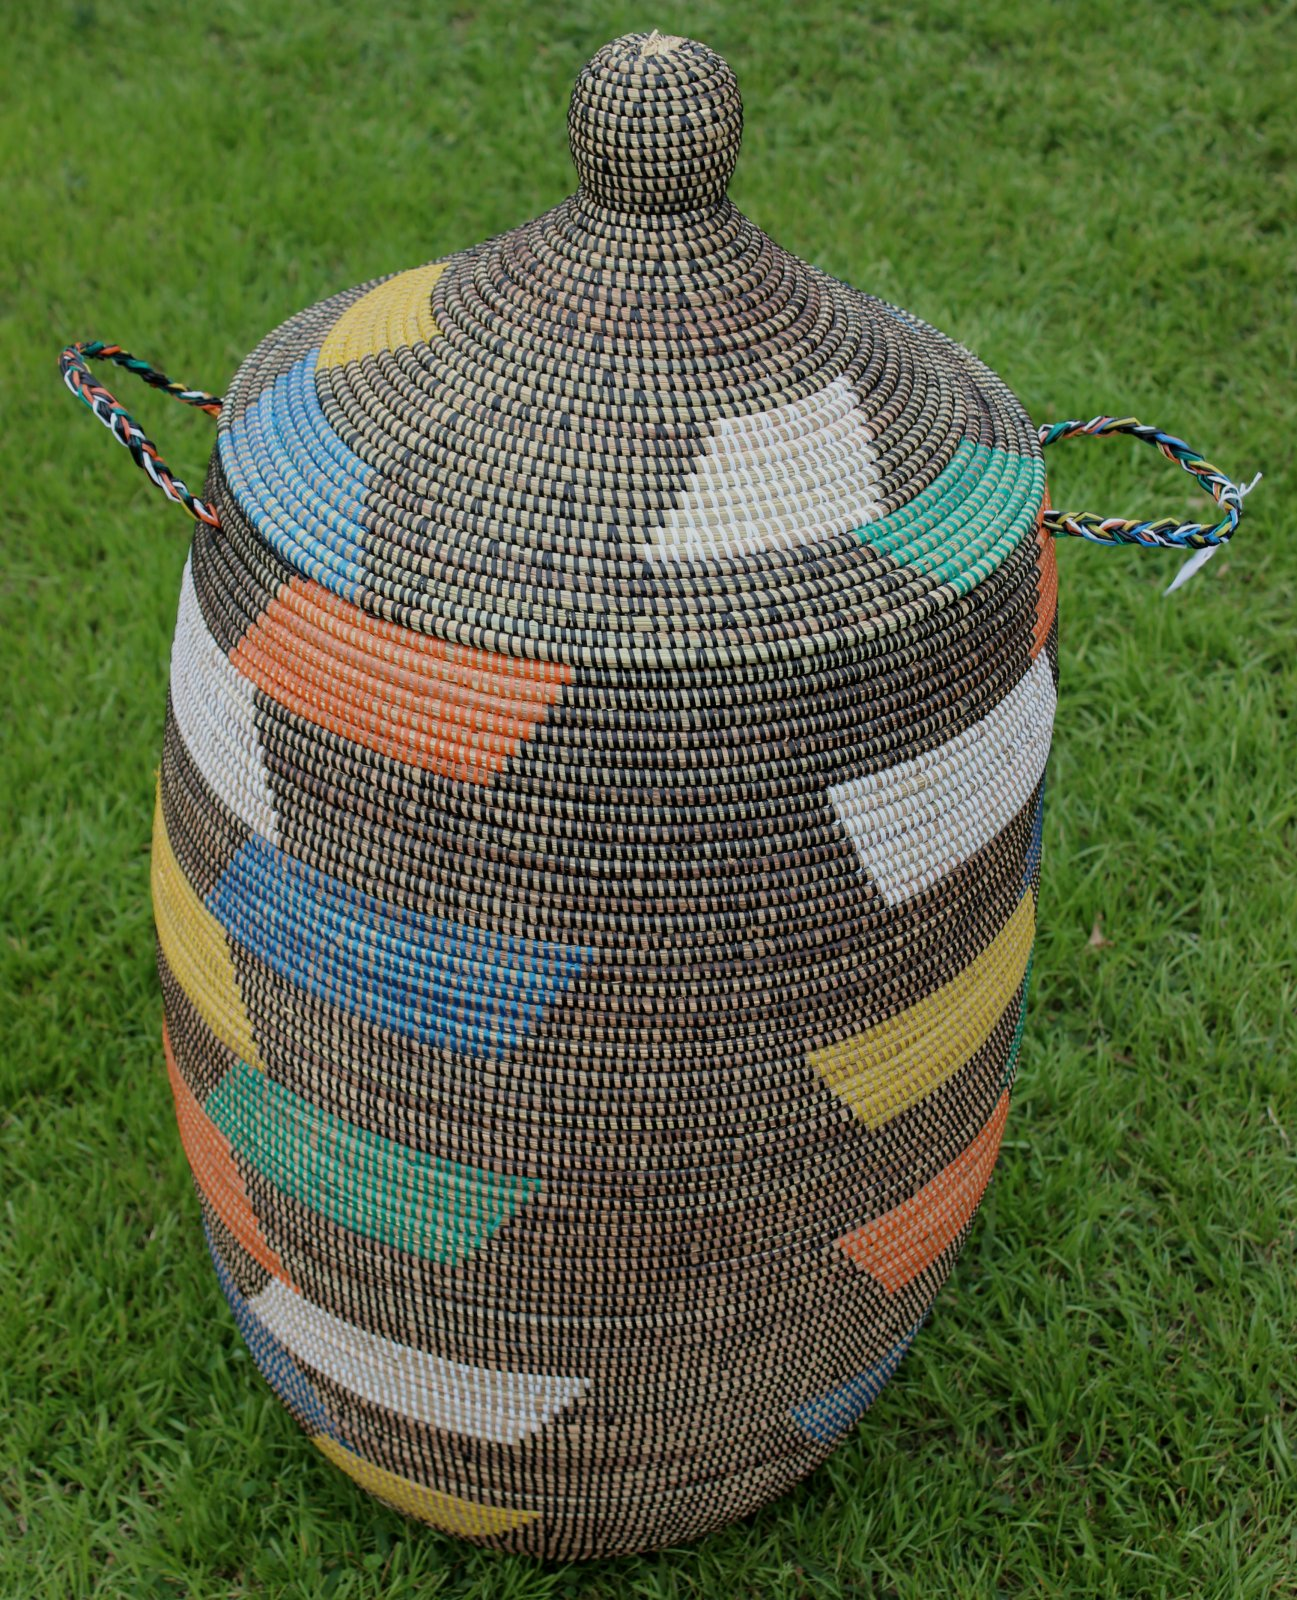 Senegal Round Top Grass Hamper XL #001